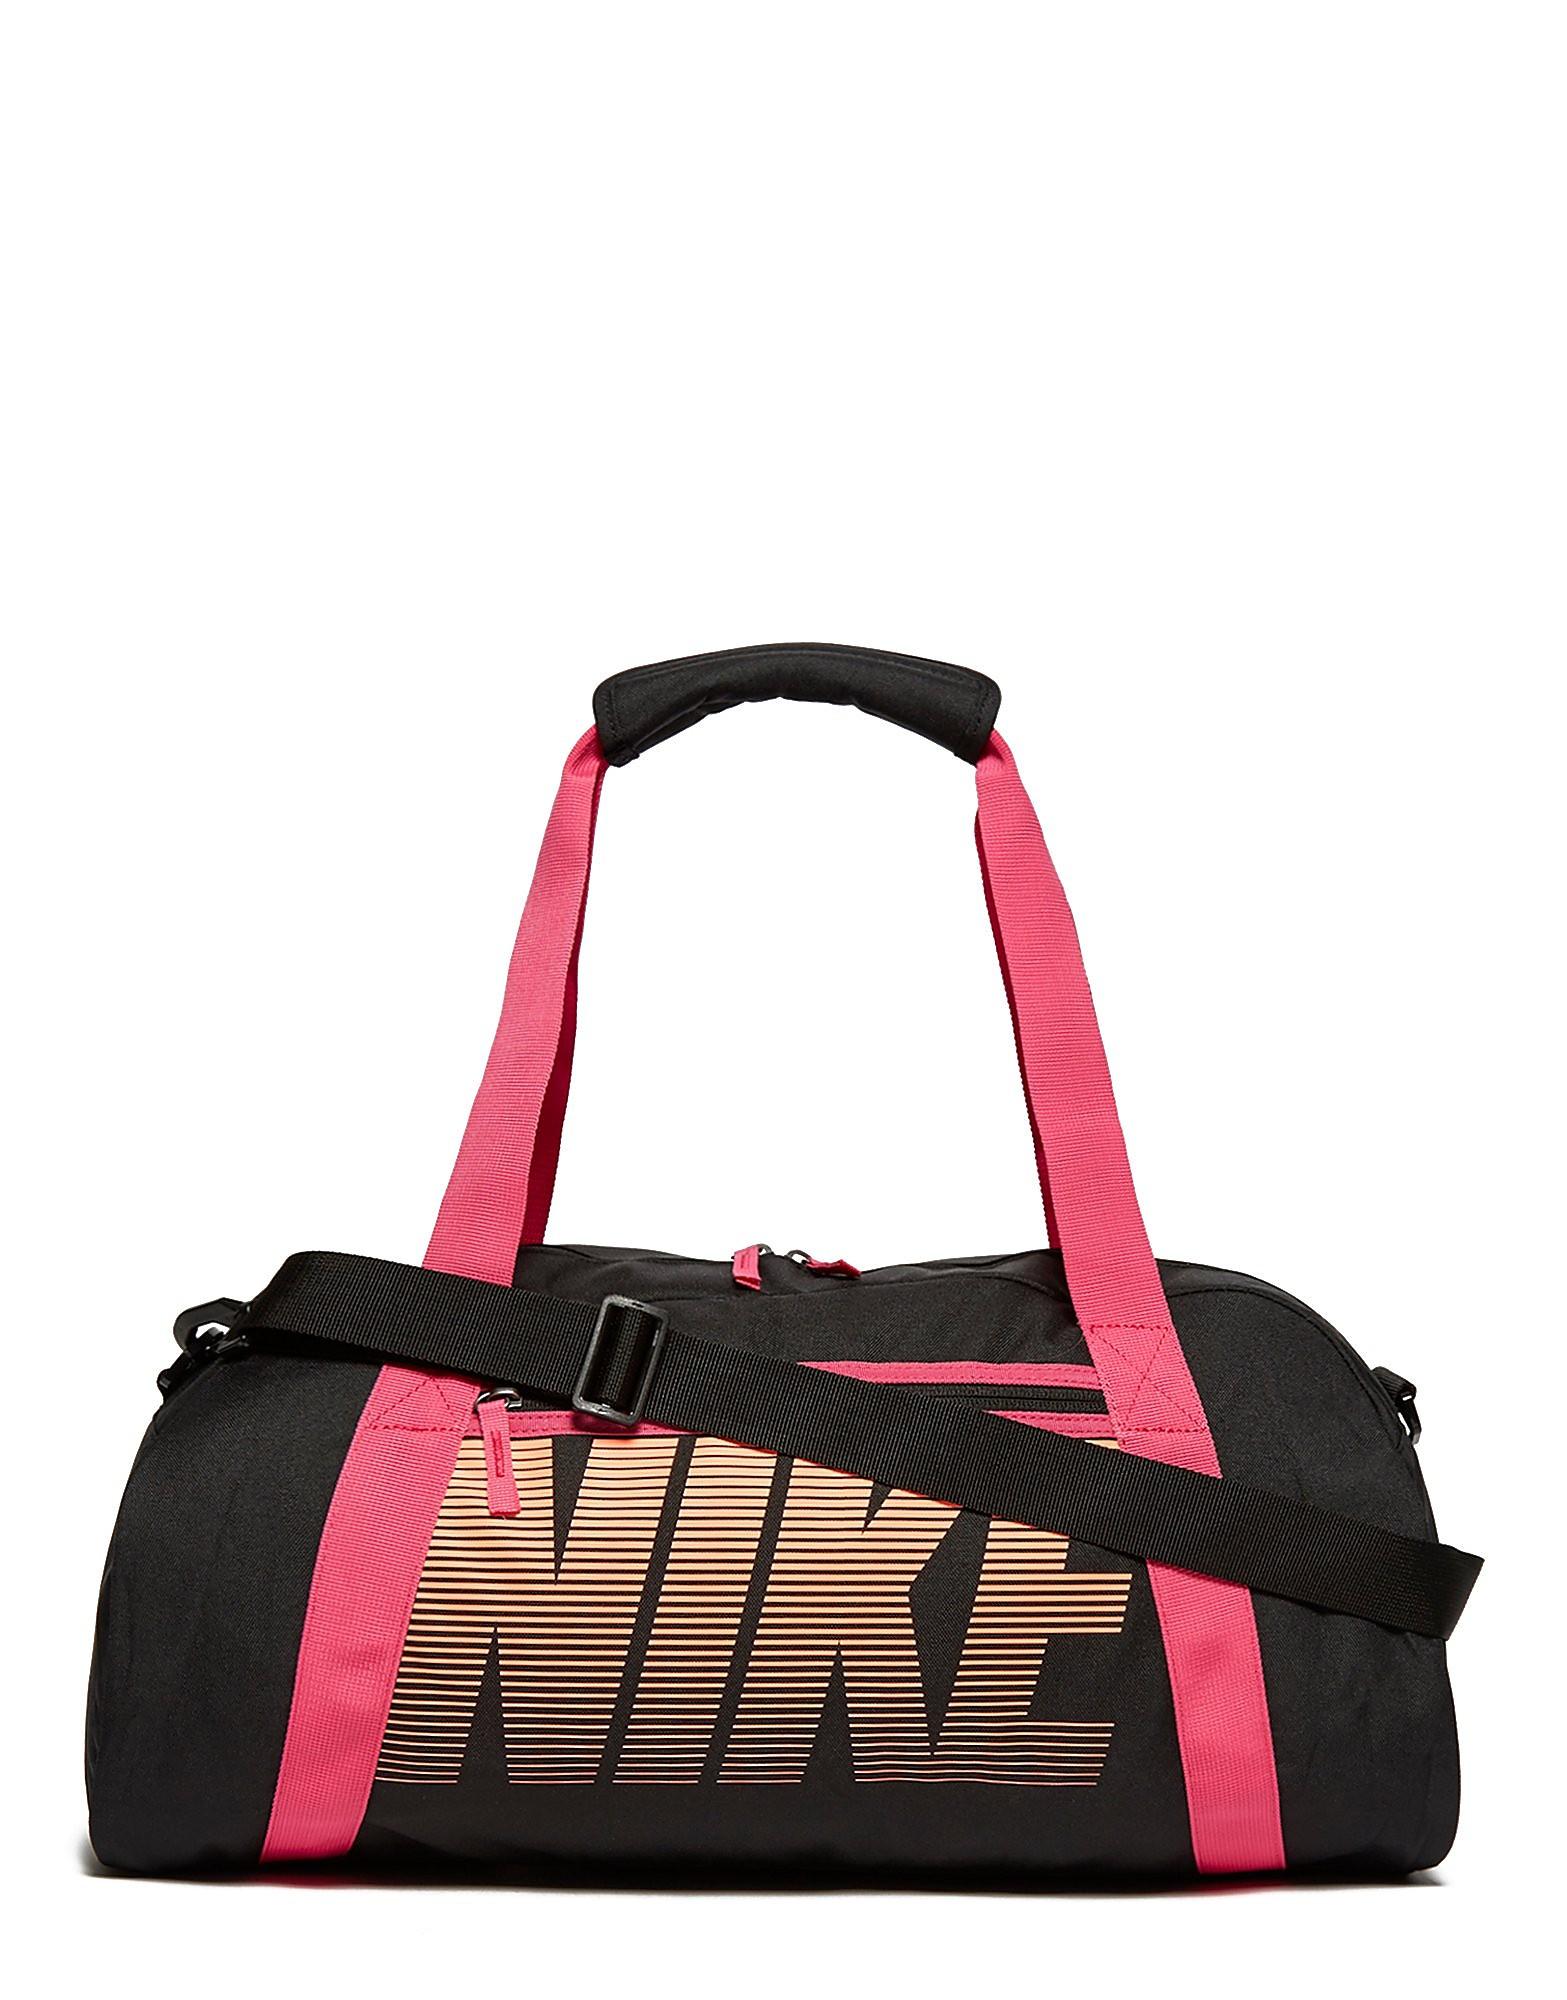 876ca1b07dfe Nike Gym Club Training Duffel Bag - Black Pink - Womens - Sports ...